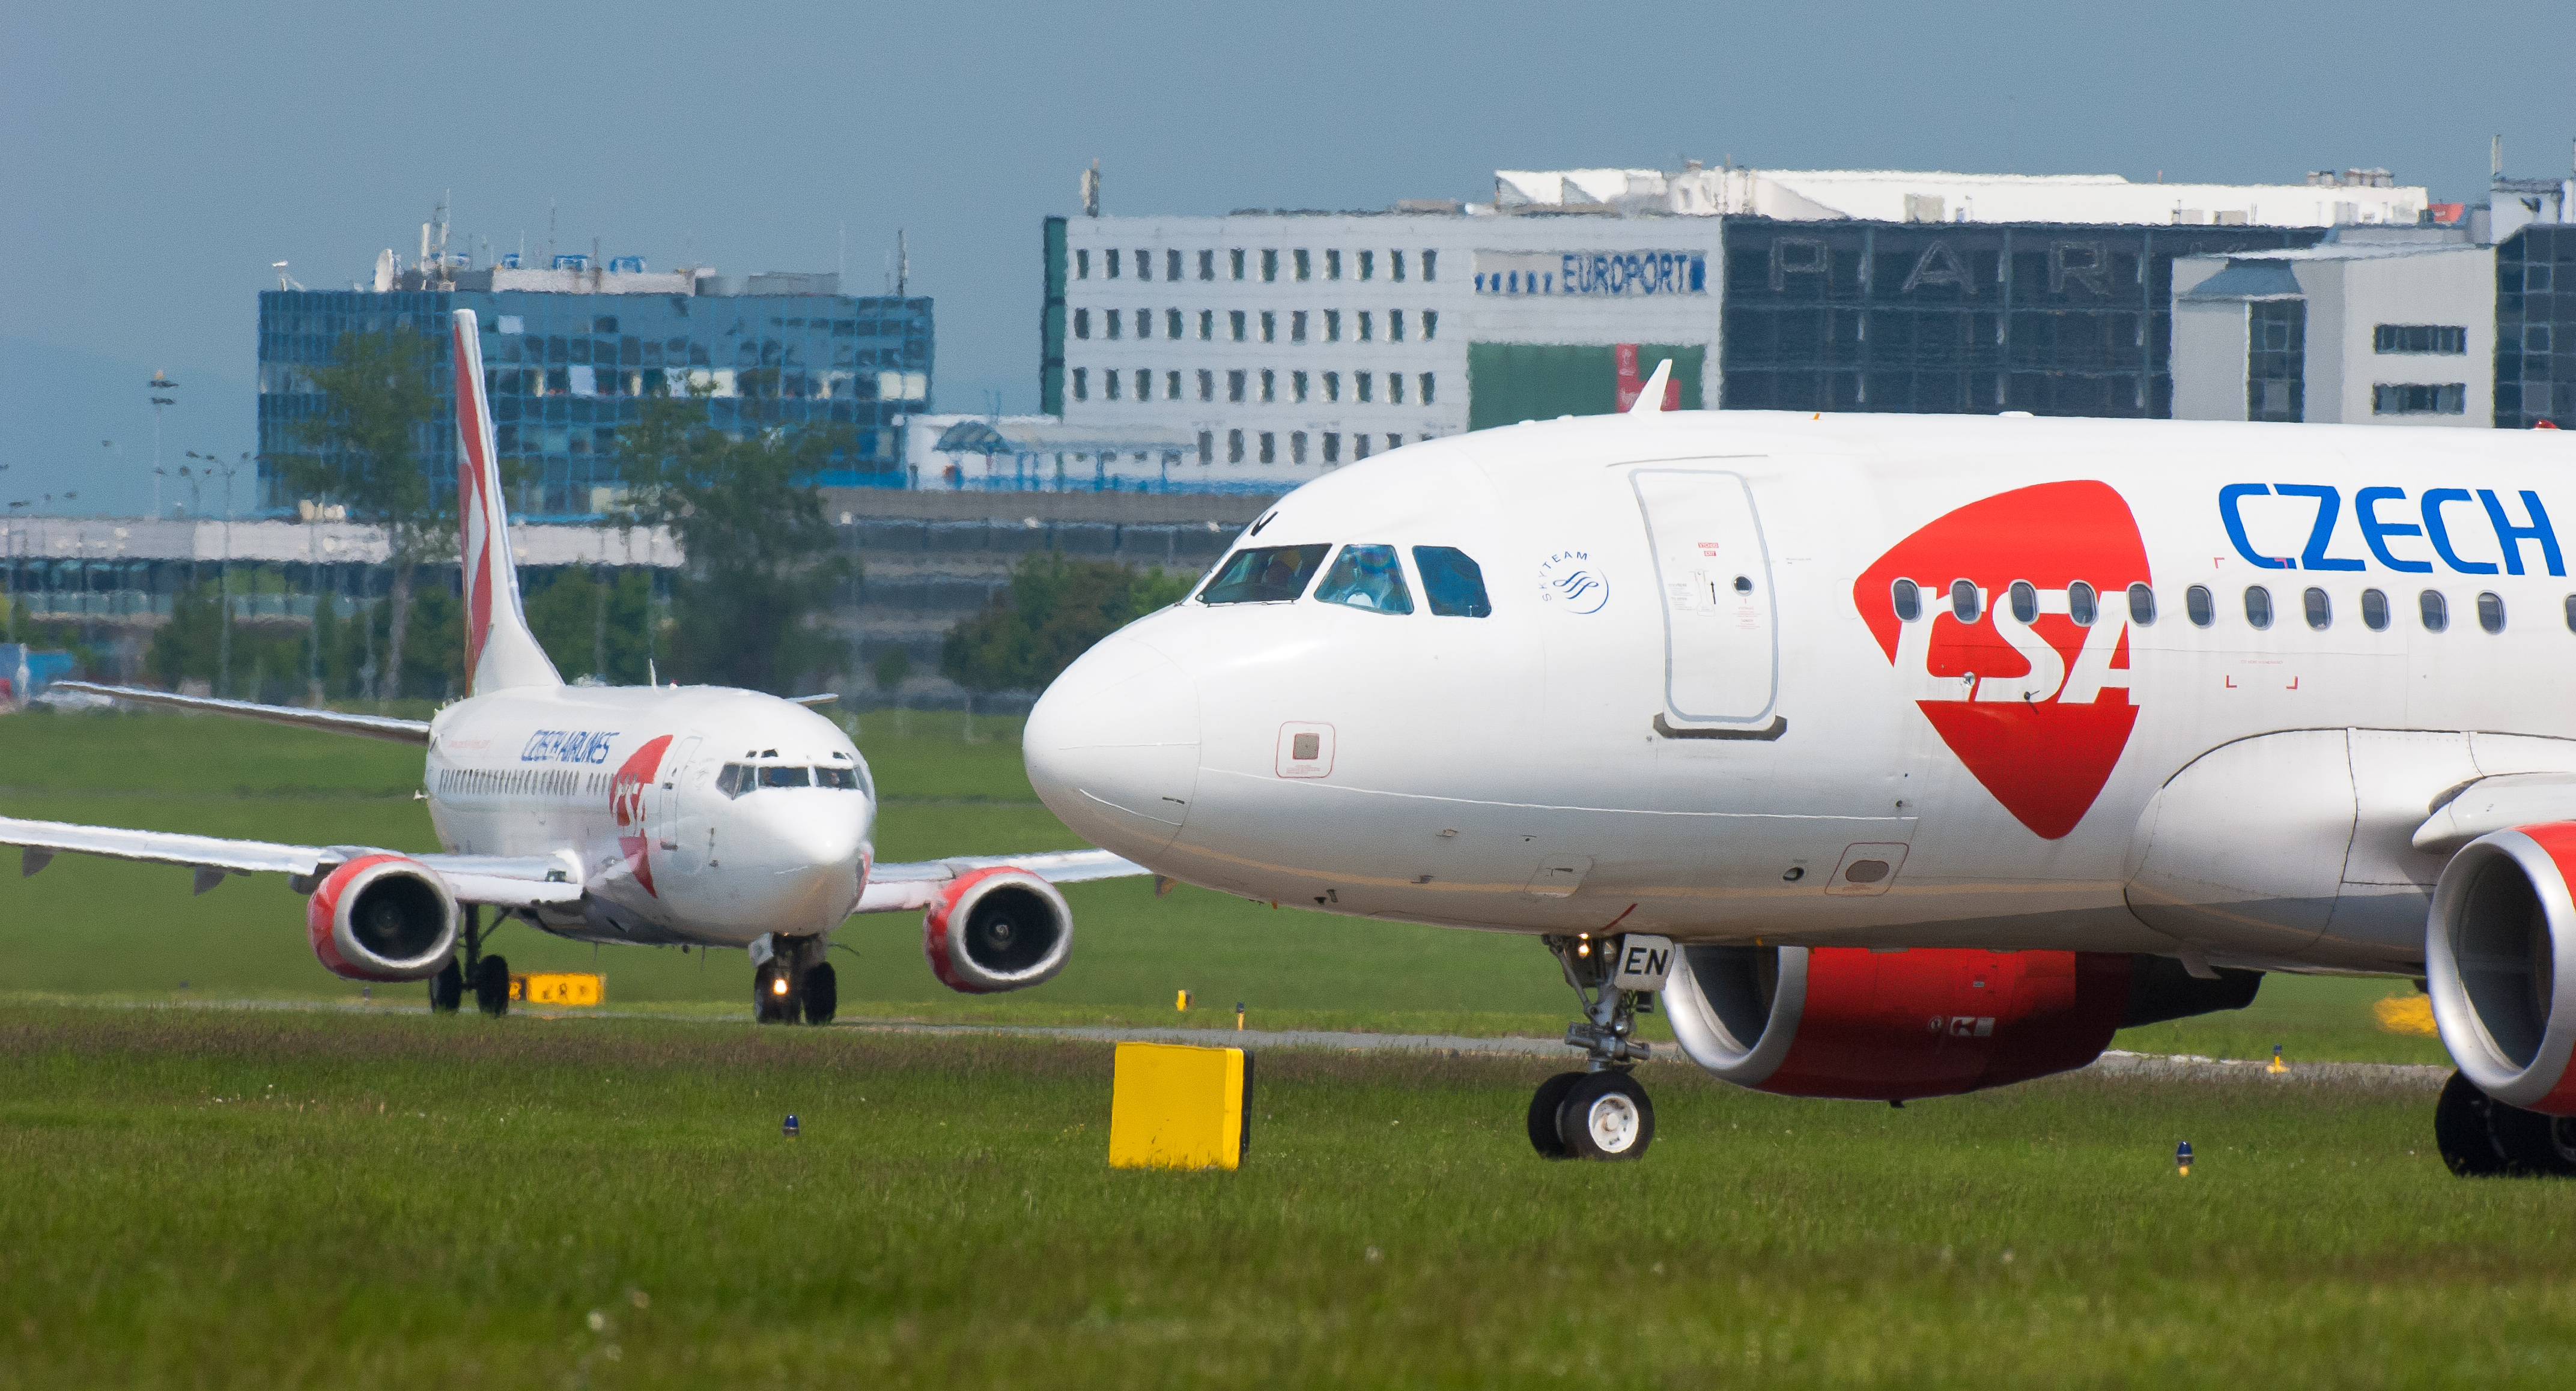 Czech Airlines ofrecerá nuevos destinos para la temporada de verano